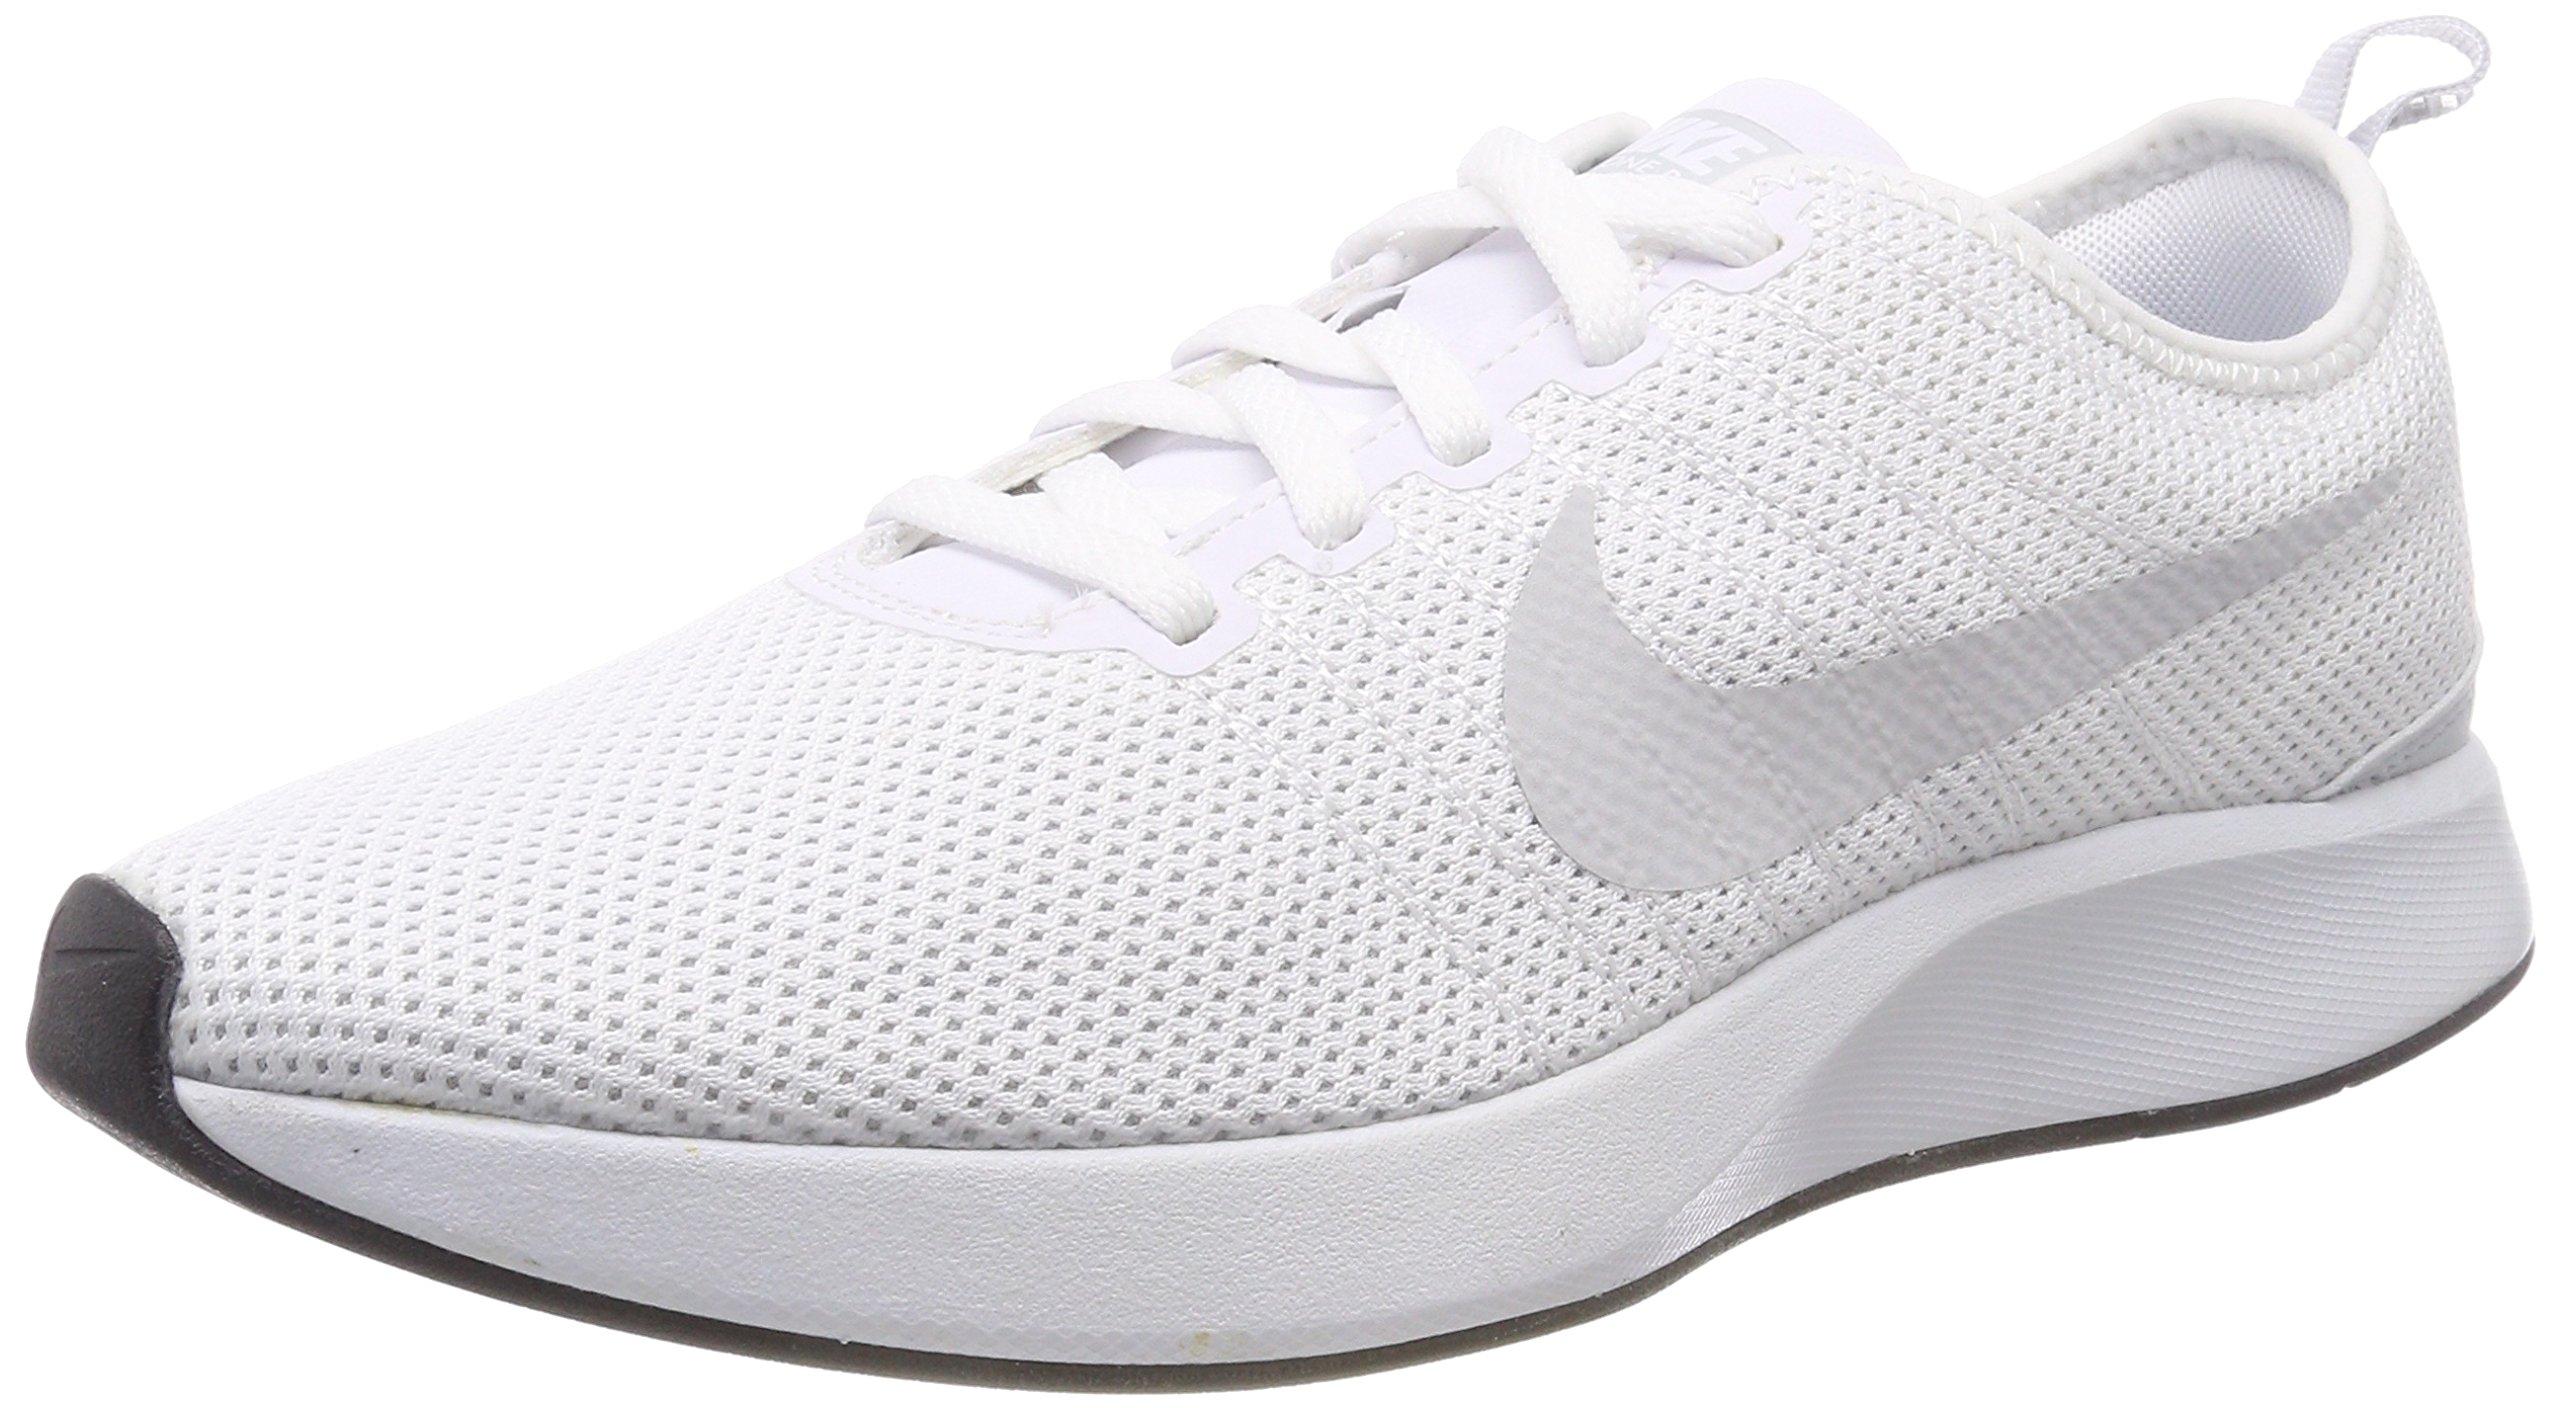 Femme Blanc Nike Eu 917682 101Protège Weißwhite41 orteils ARj35cq4L